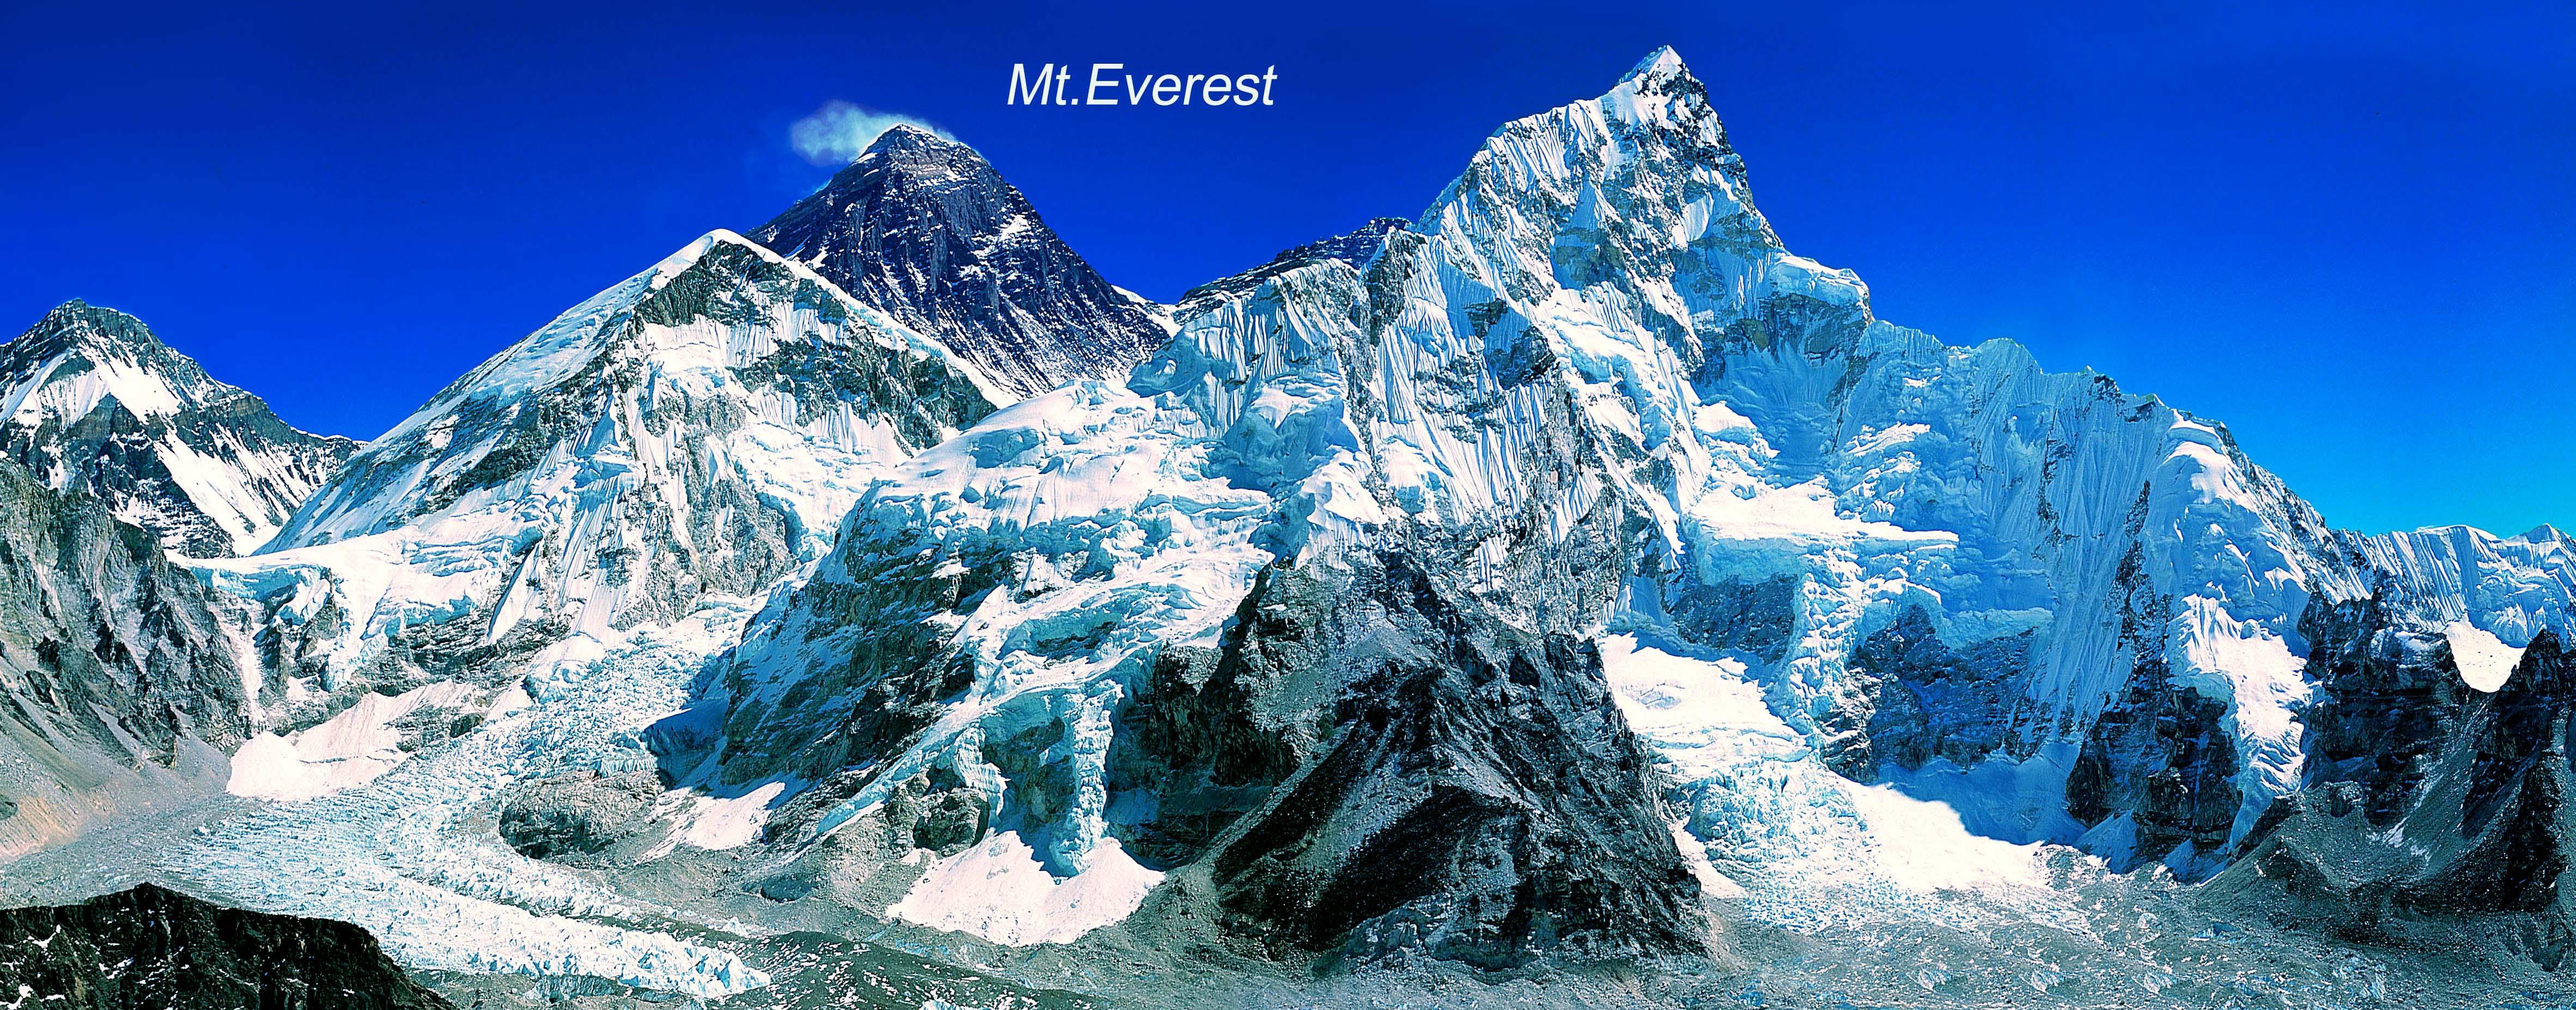 everest-8848m.jpg